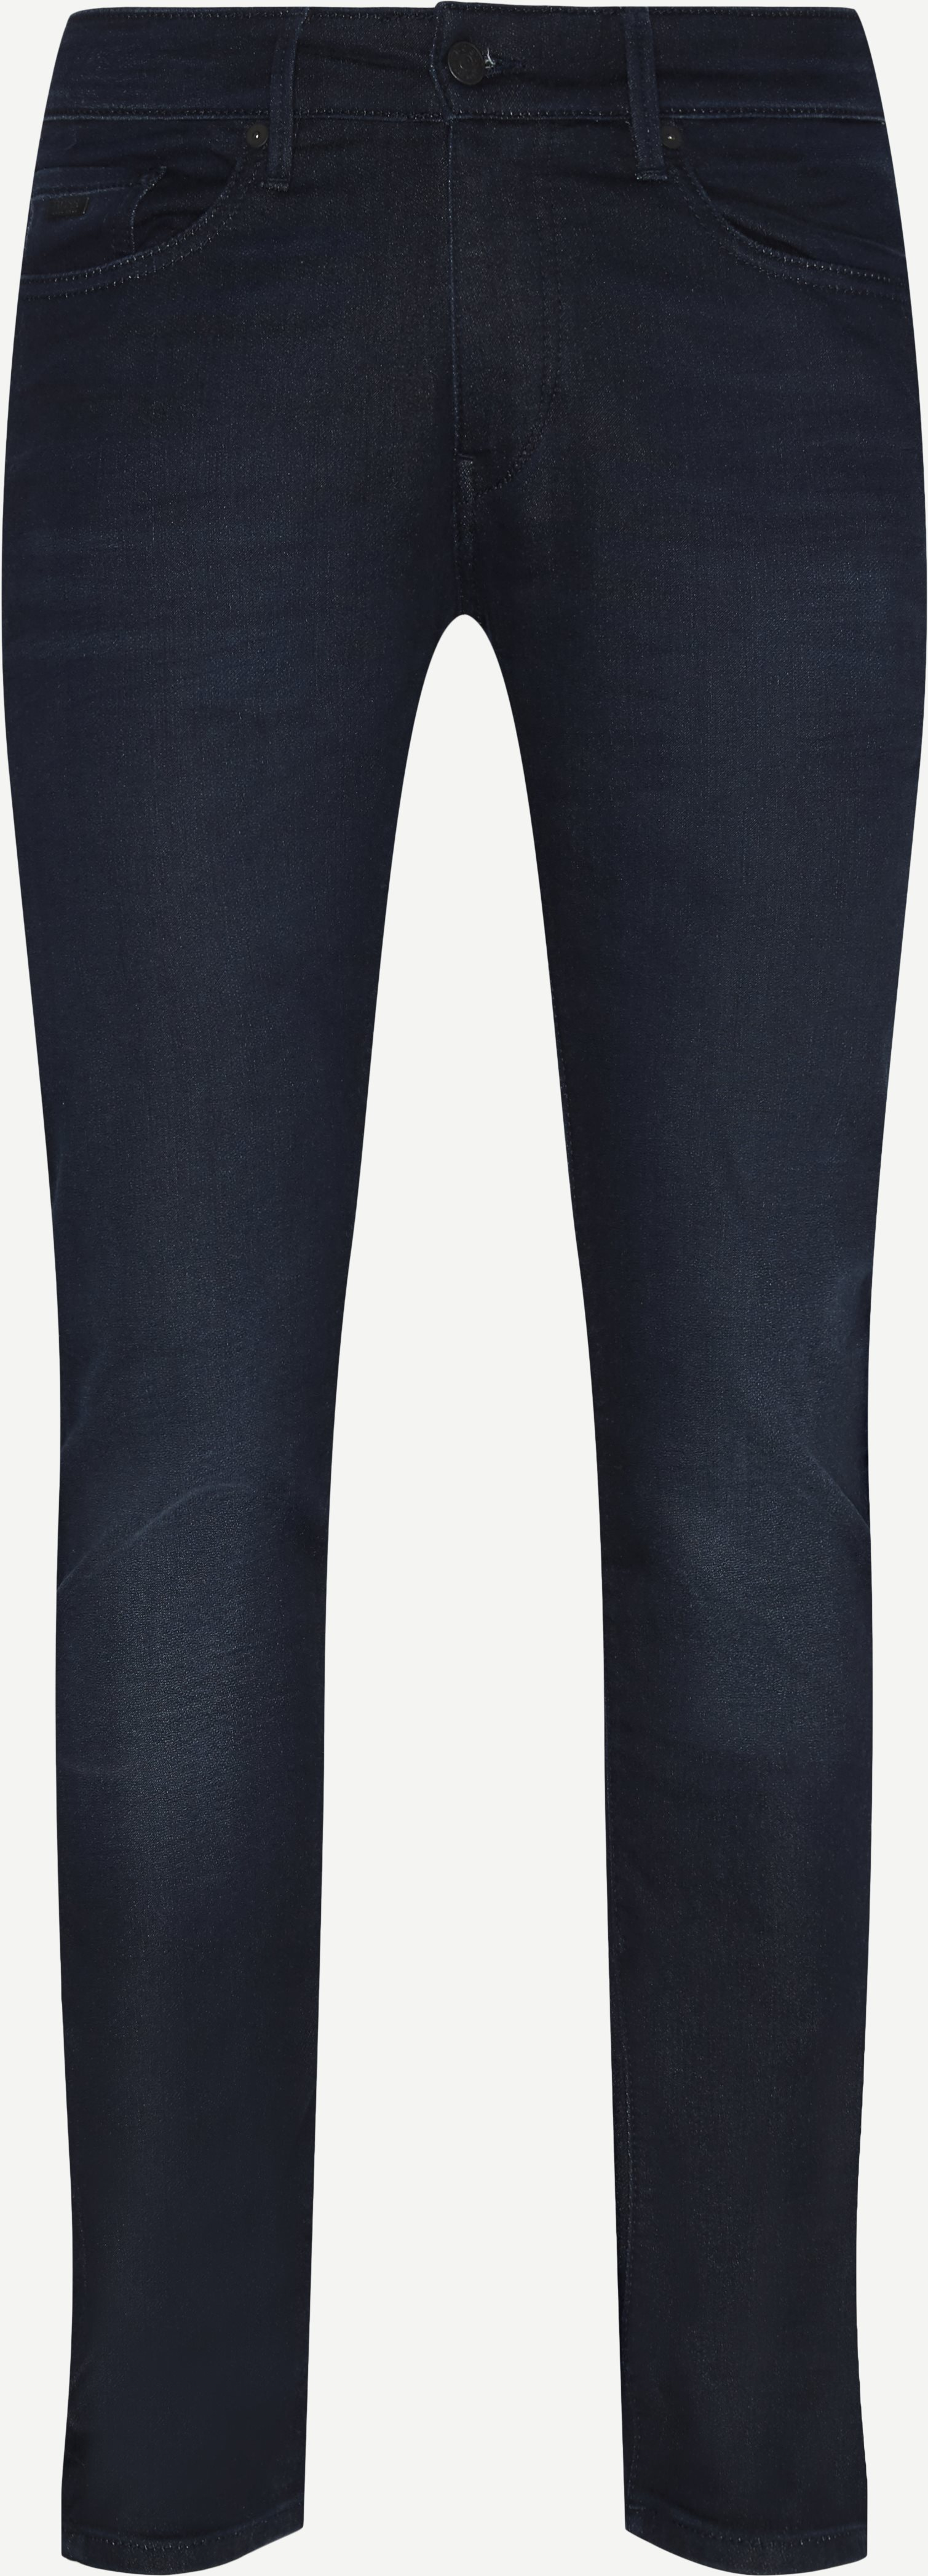 Jeans - Ekstra slim fit - Denim